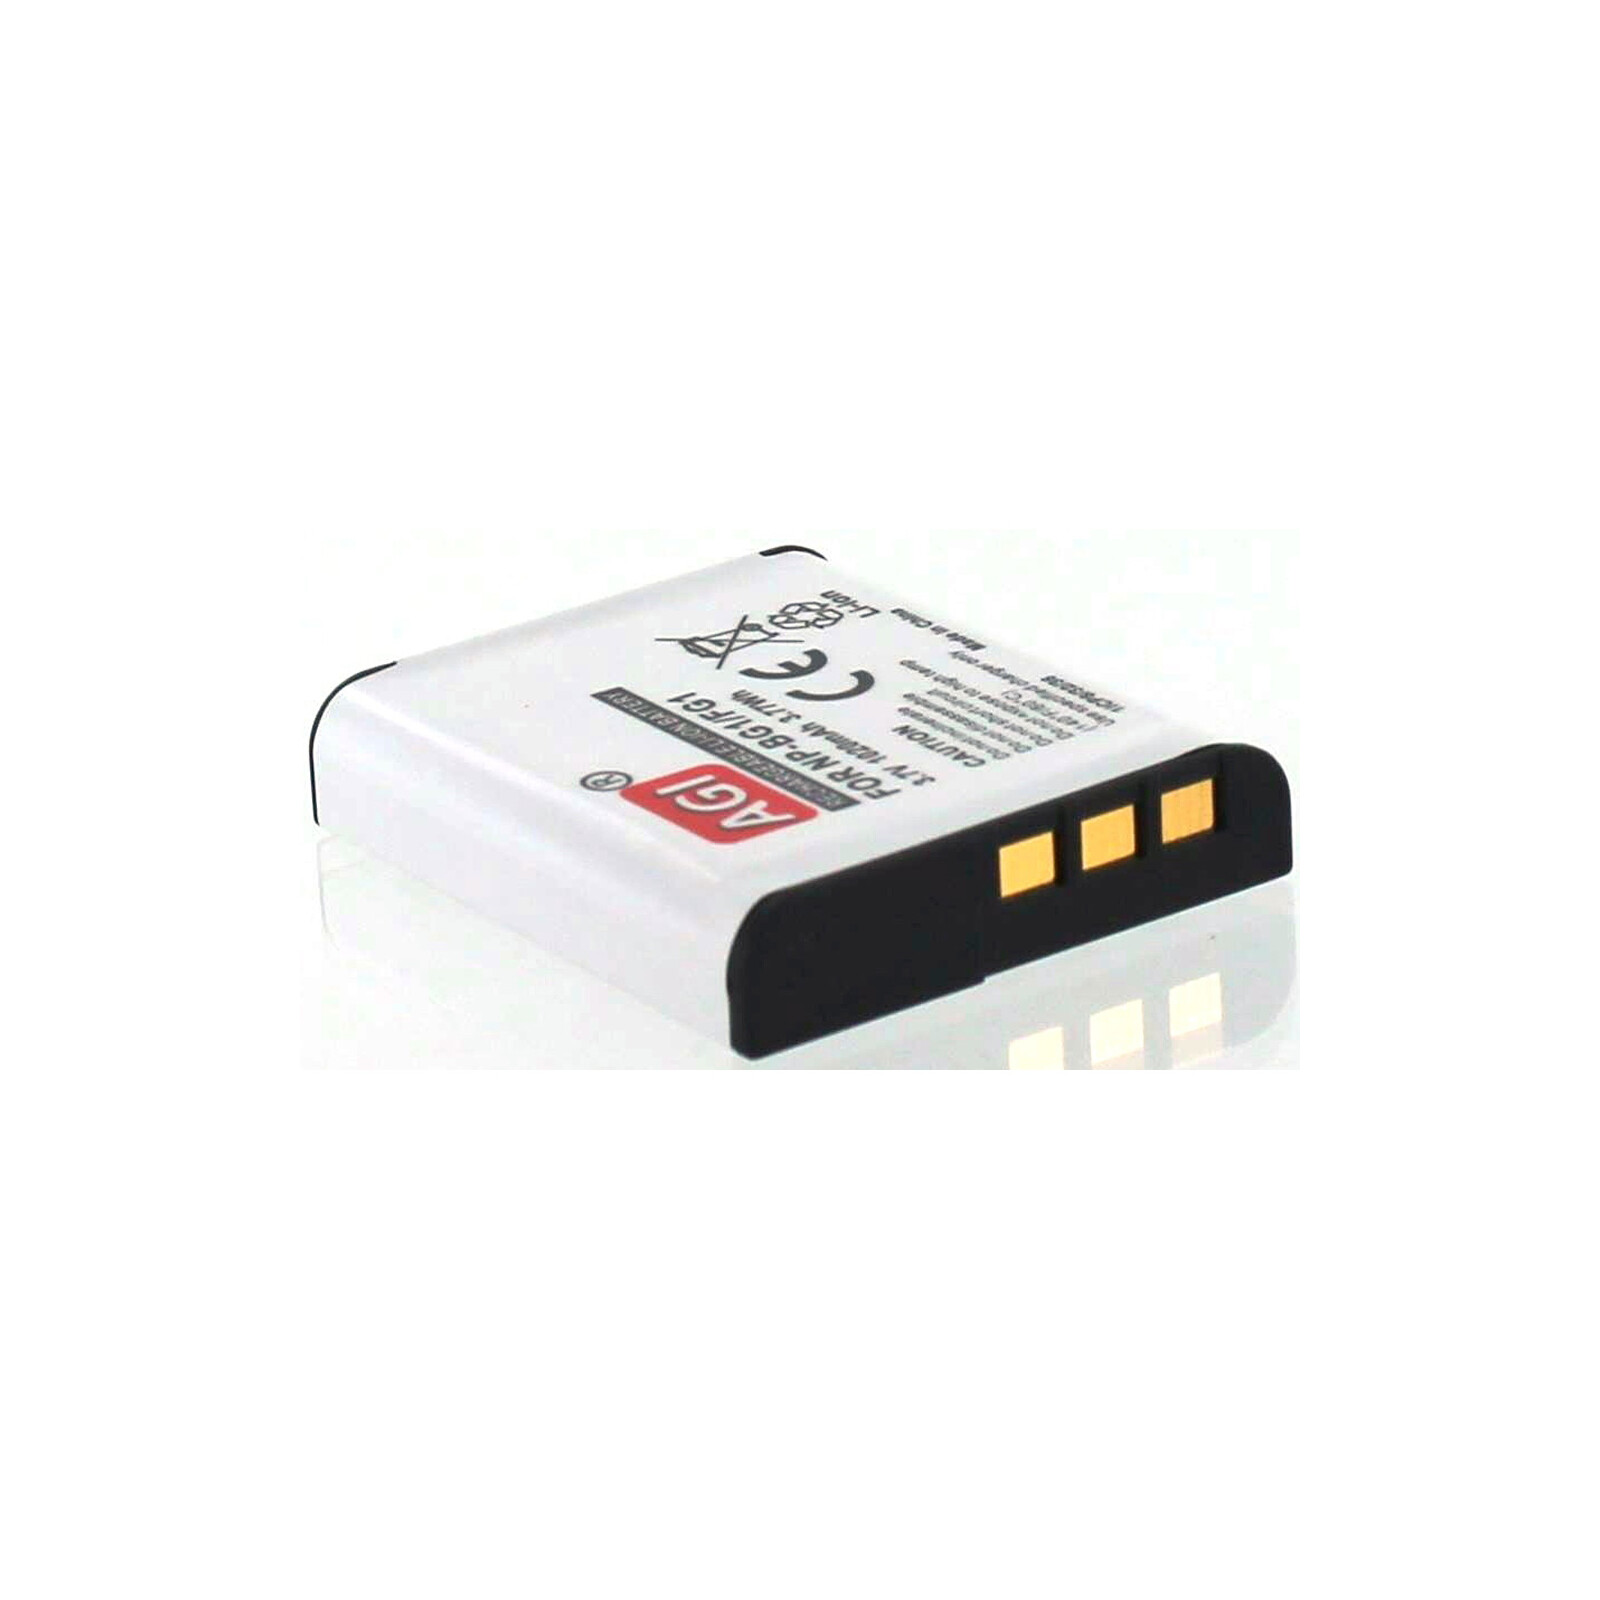 AGI 74380 Akku Sony DSC-W230